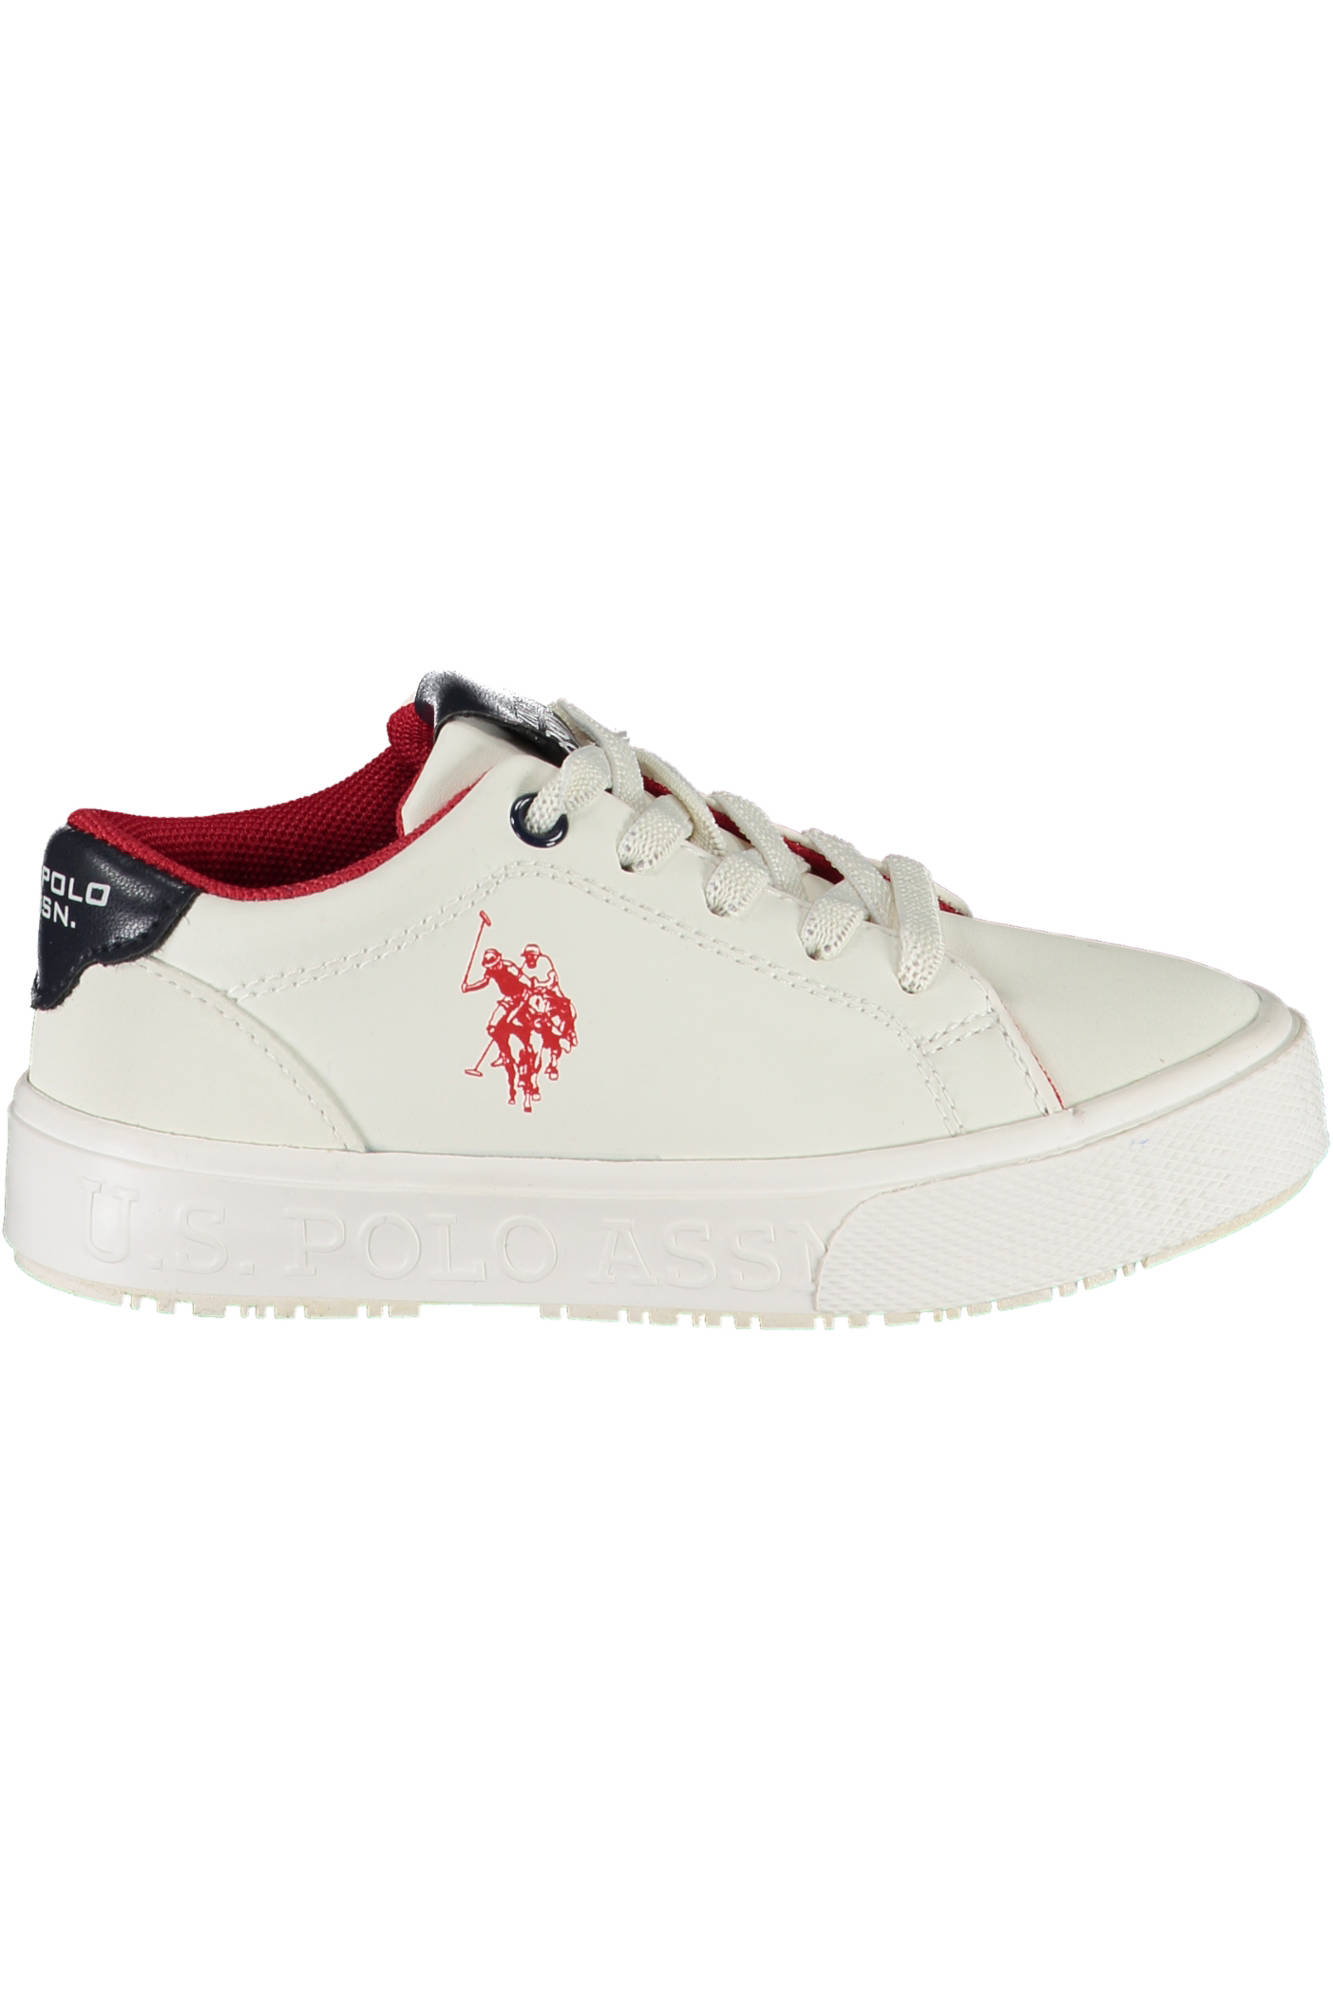 U.S. POLO ASSN. Sport Shoes BIANCO